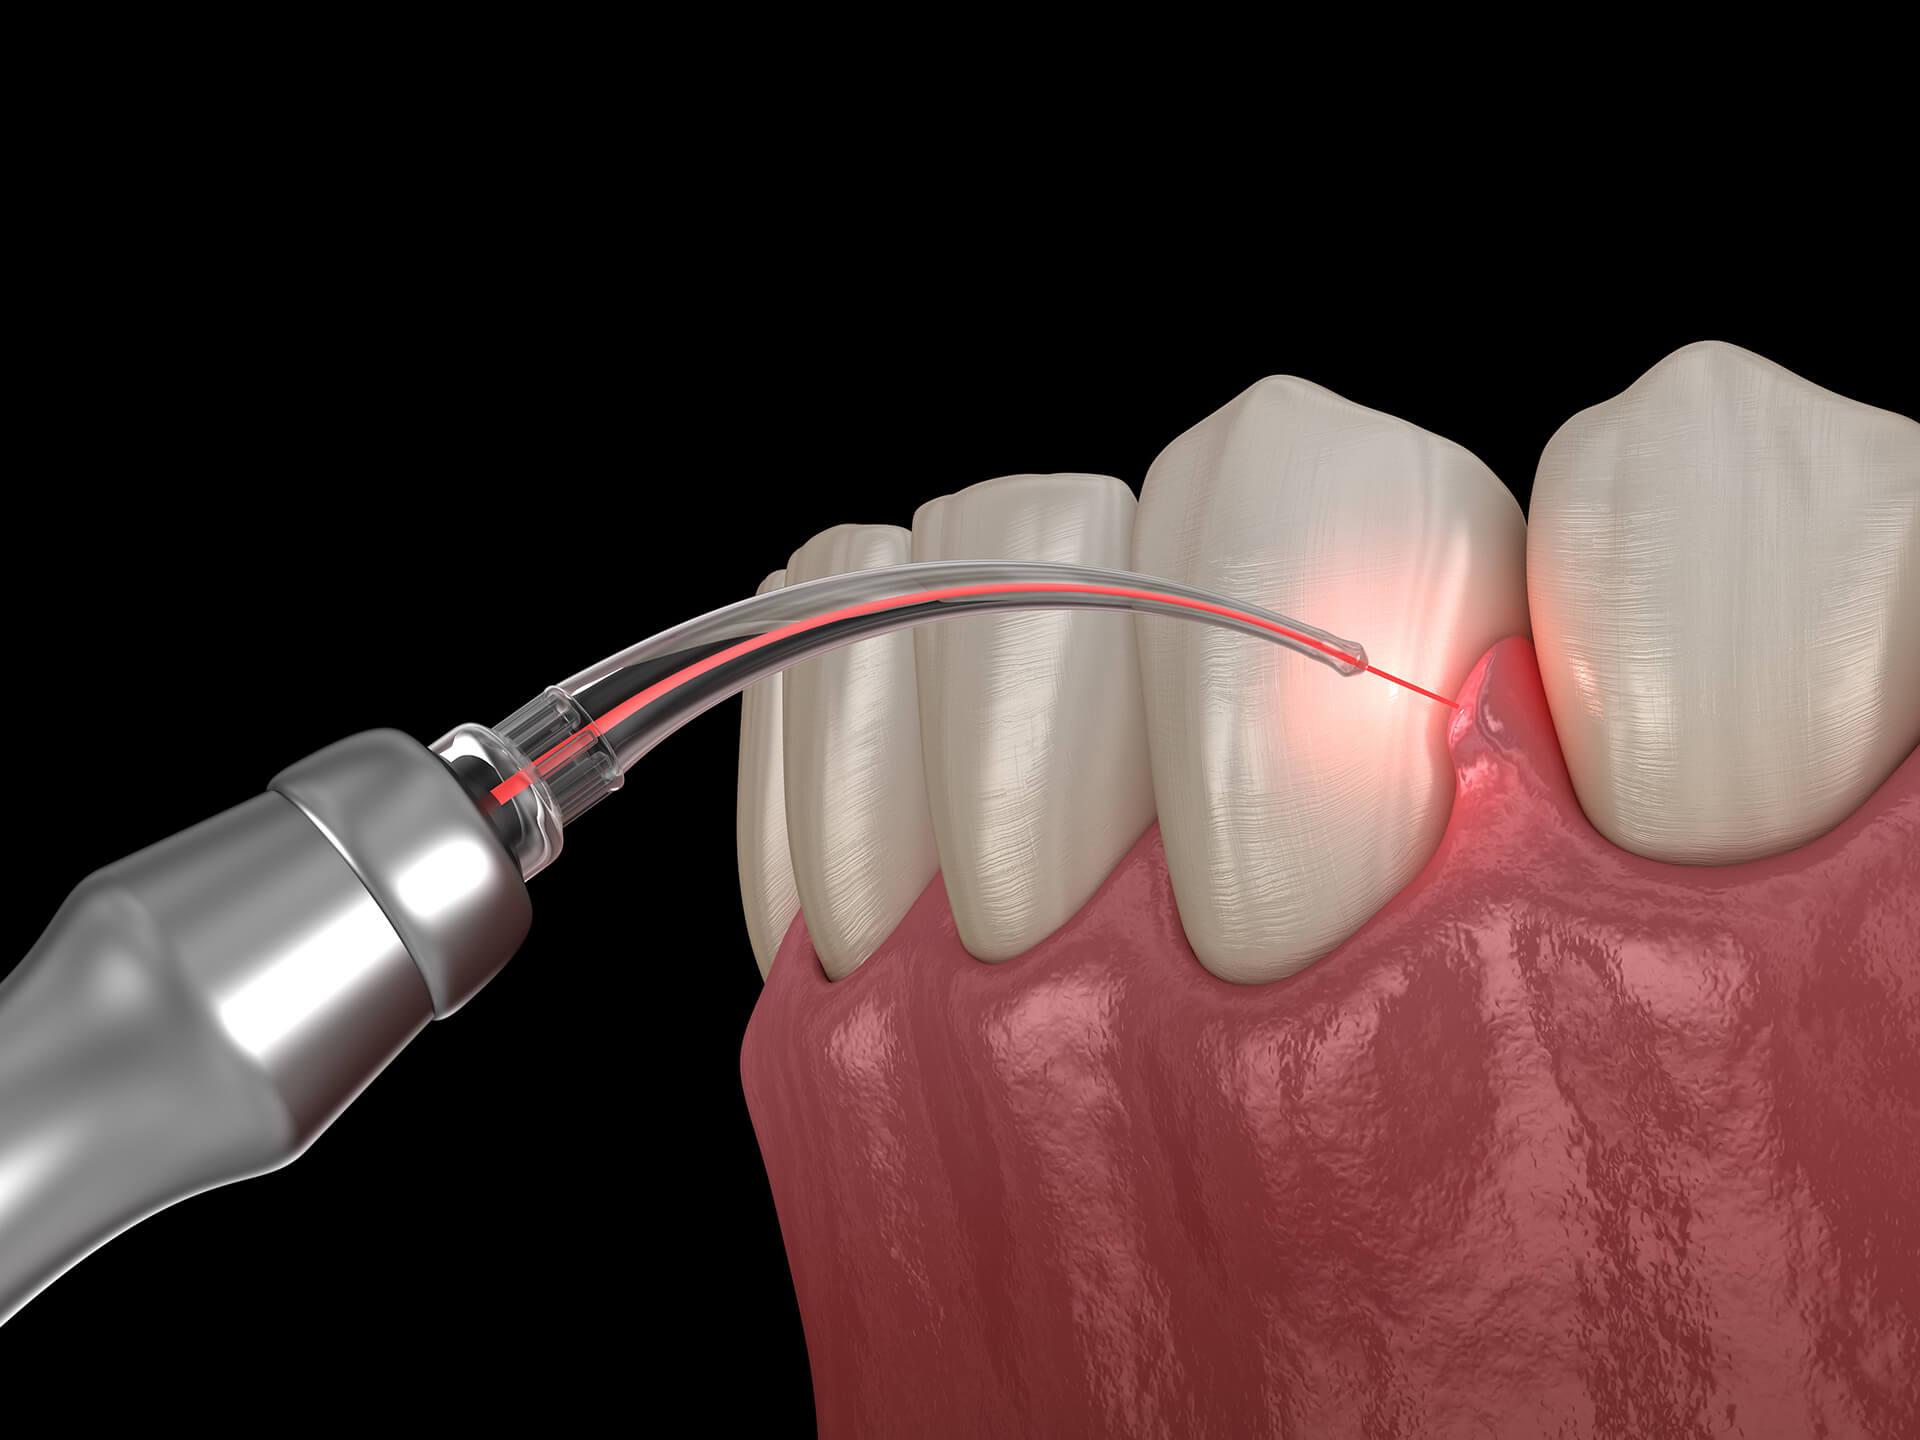 laser dentistry san jose ca